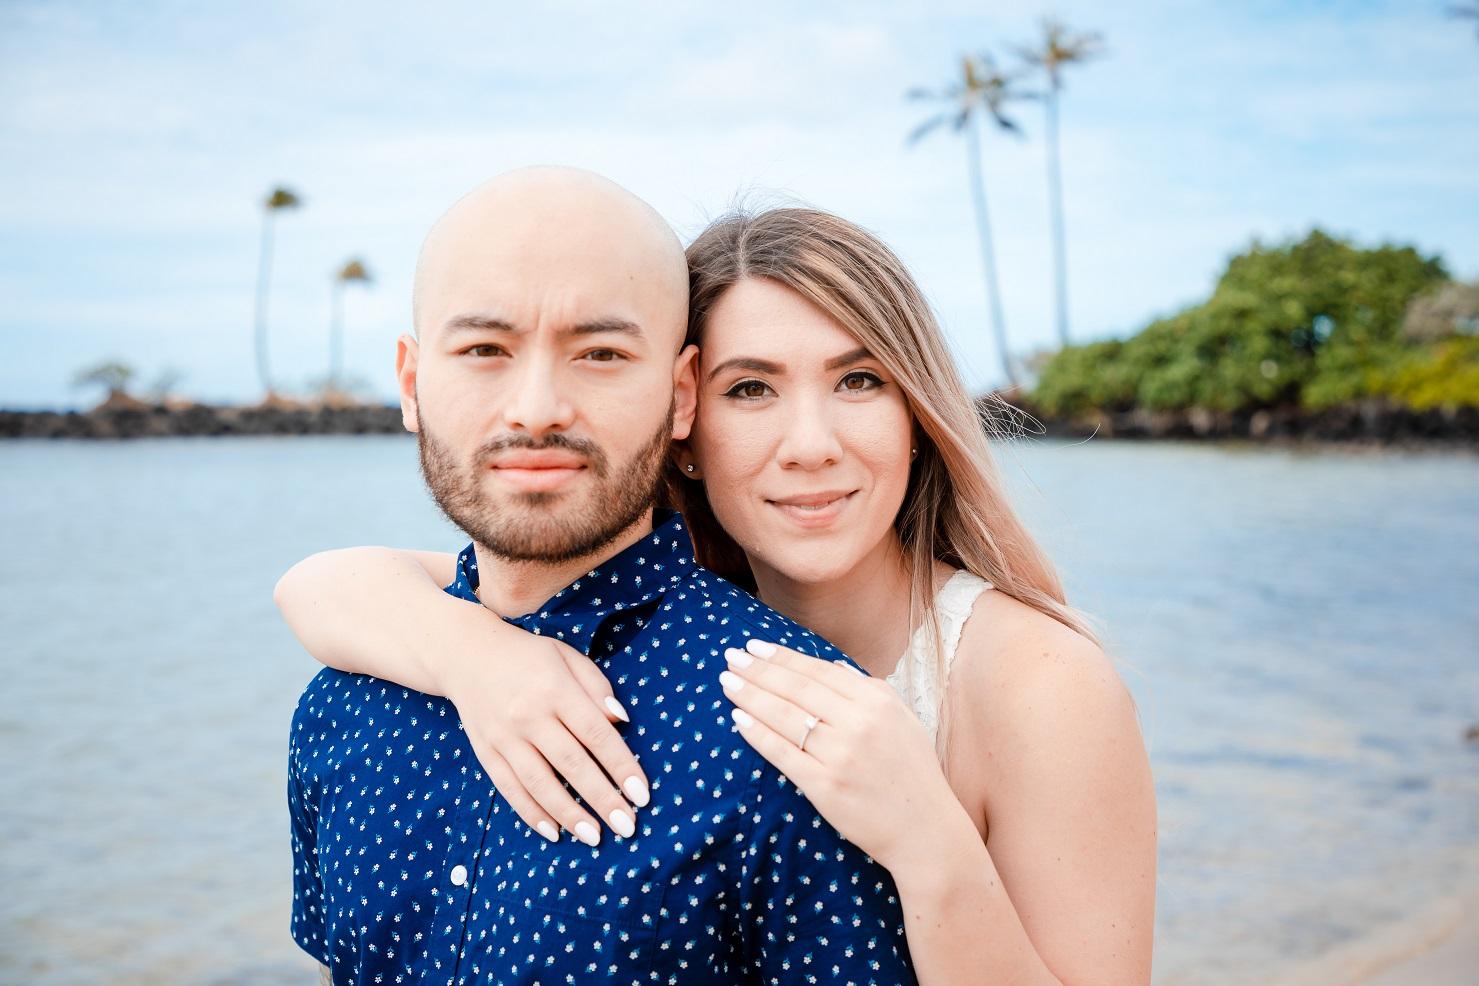 couples engagement proposal photography waikiki oahu hawaii